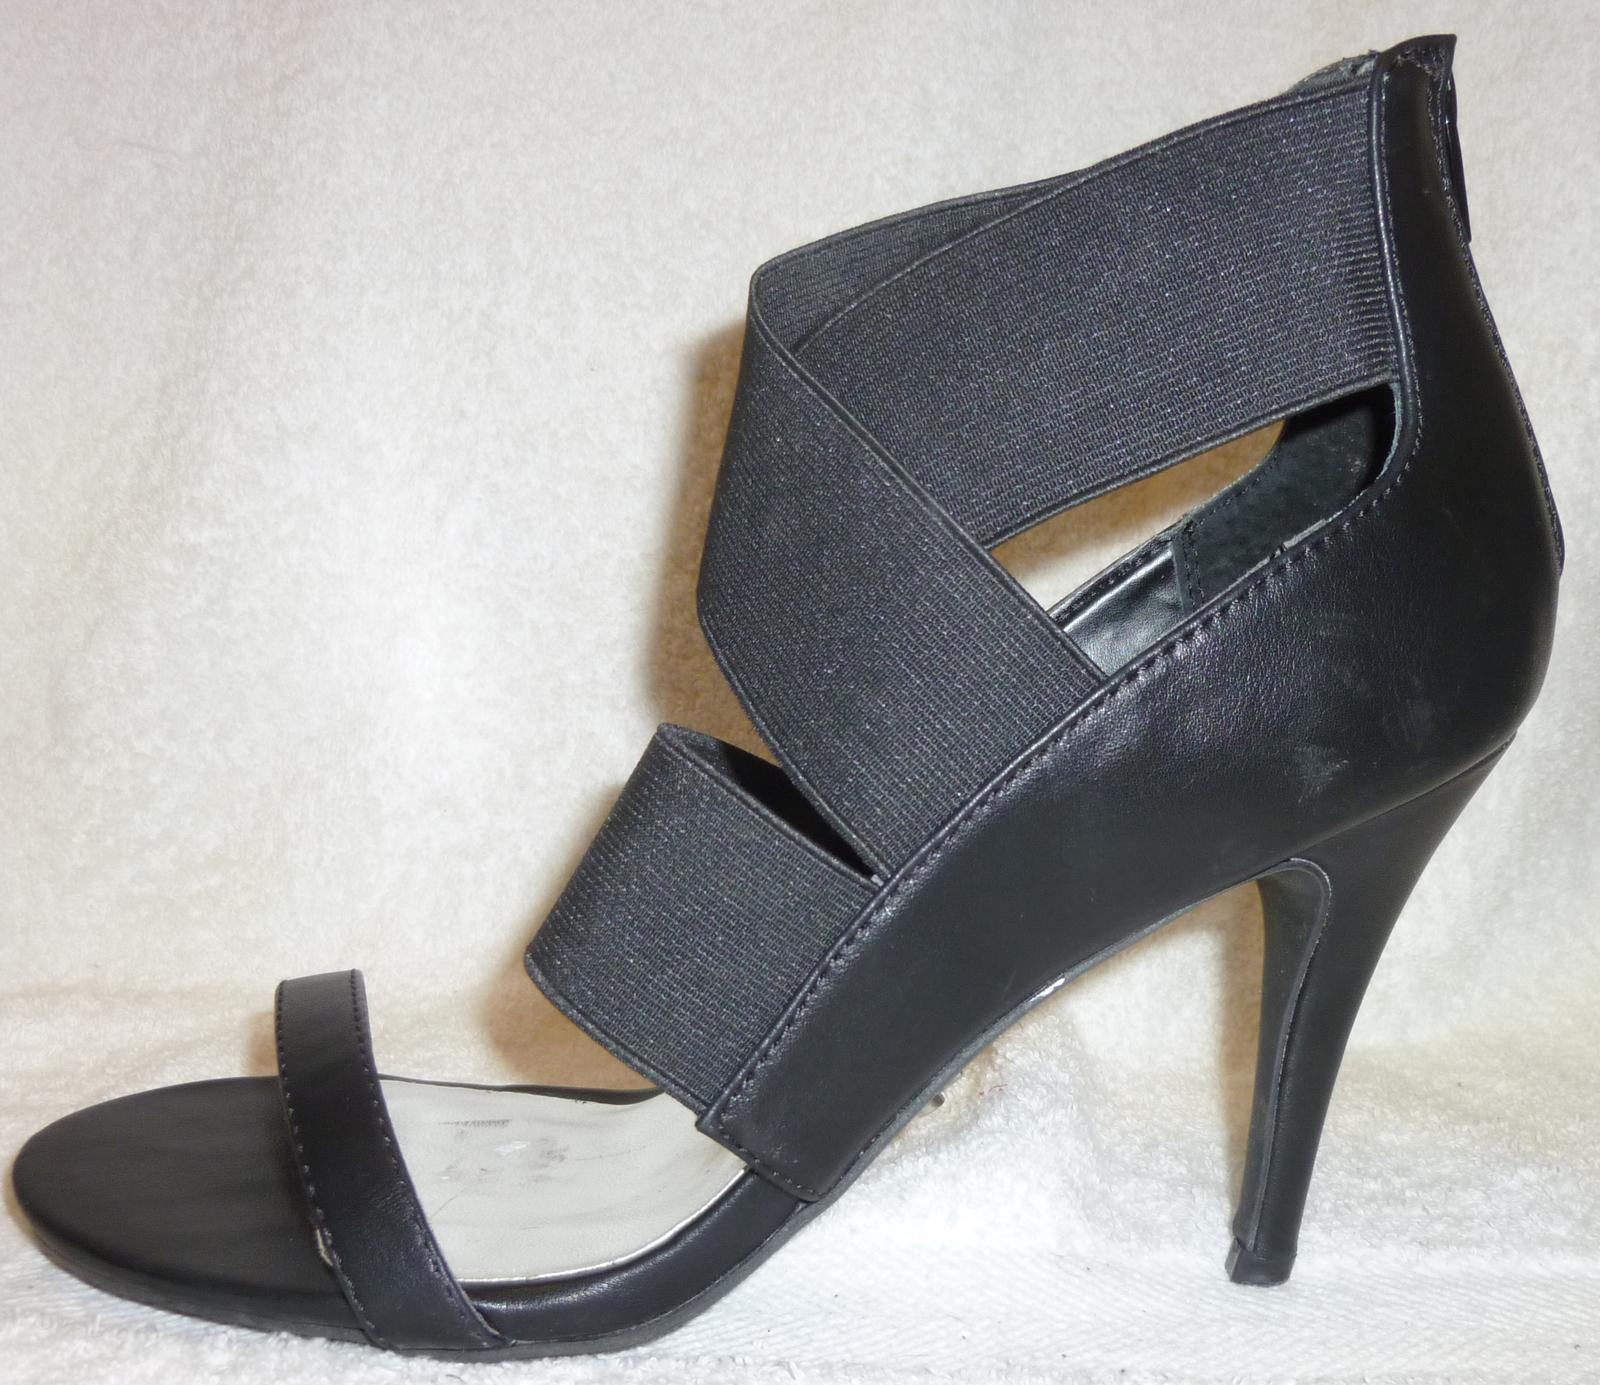 ad3fe977fbd Simply Vera by Vera Wang NEW Black Strappy High Heel Sandals 10 B -  17.99